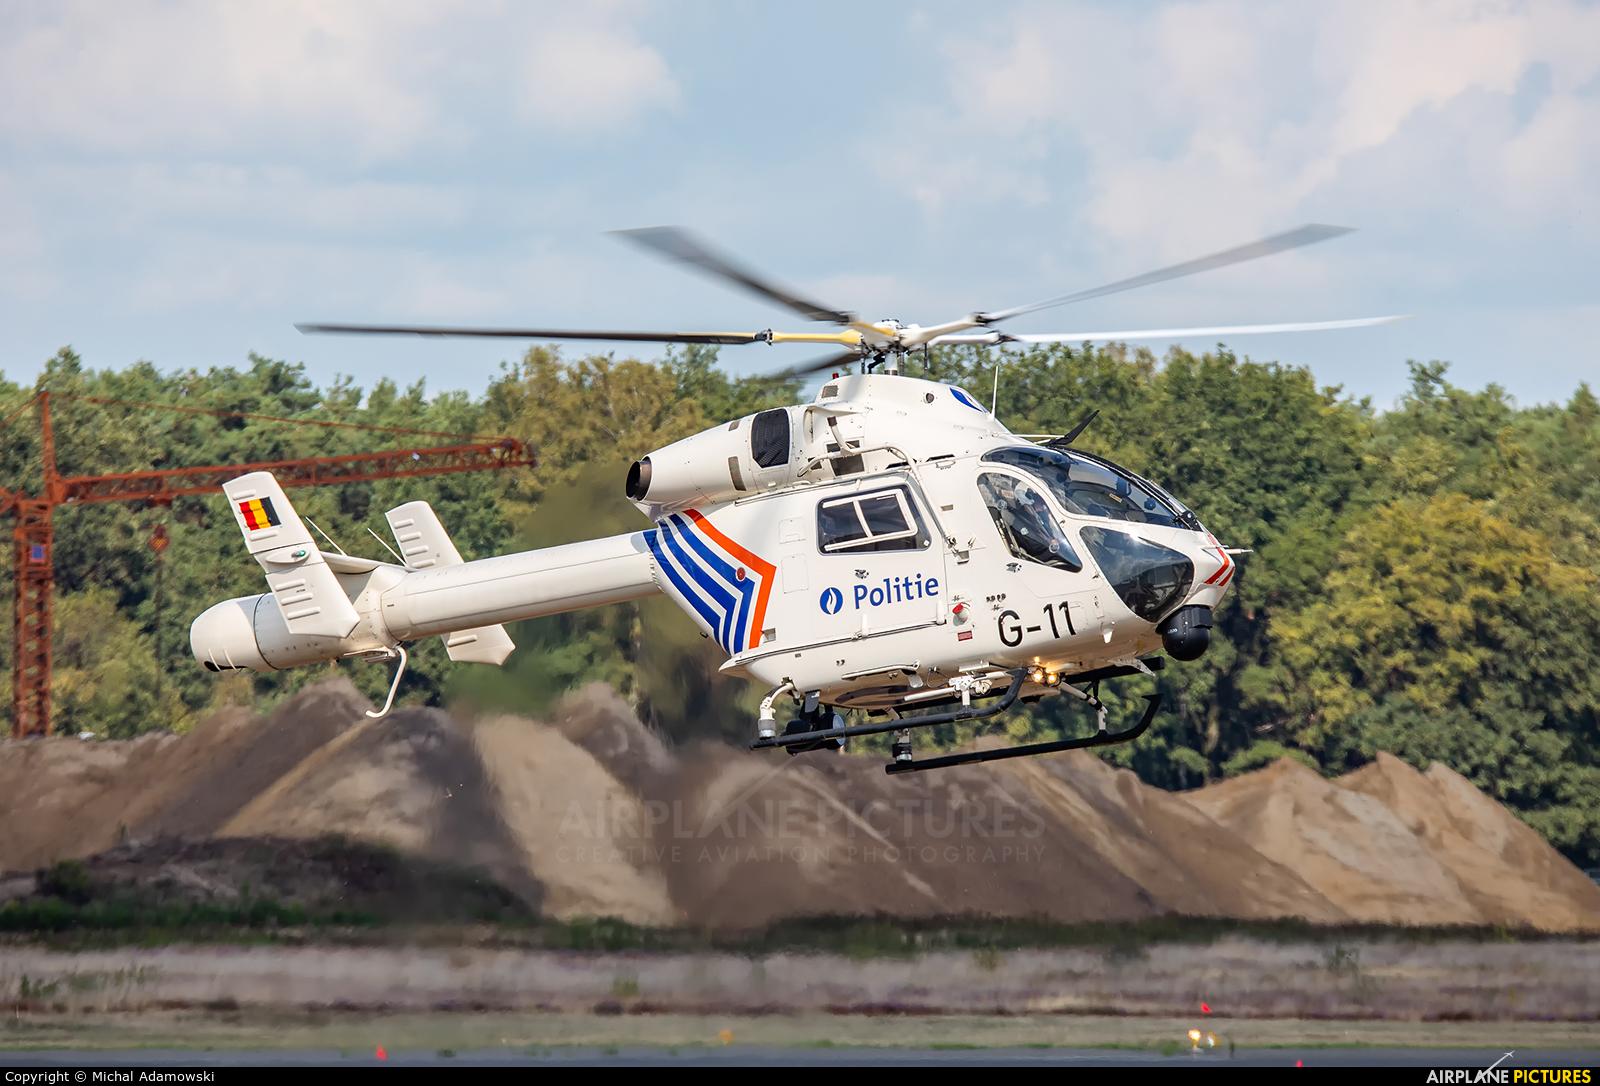 Belgium - Police G-11 aircraft at Kleine Brogel